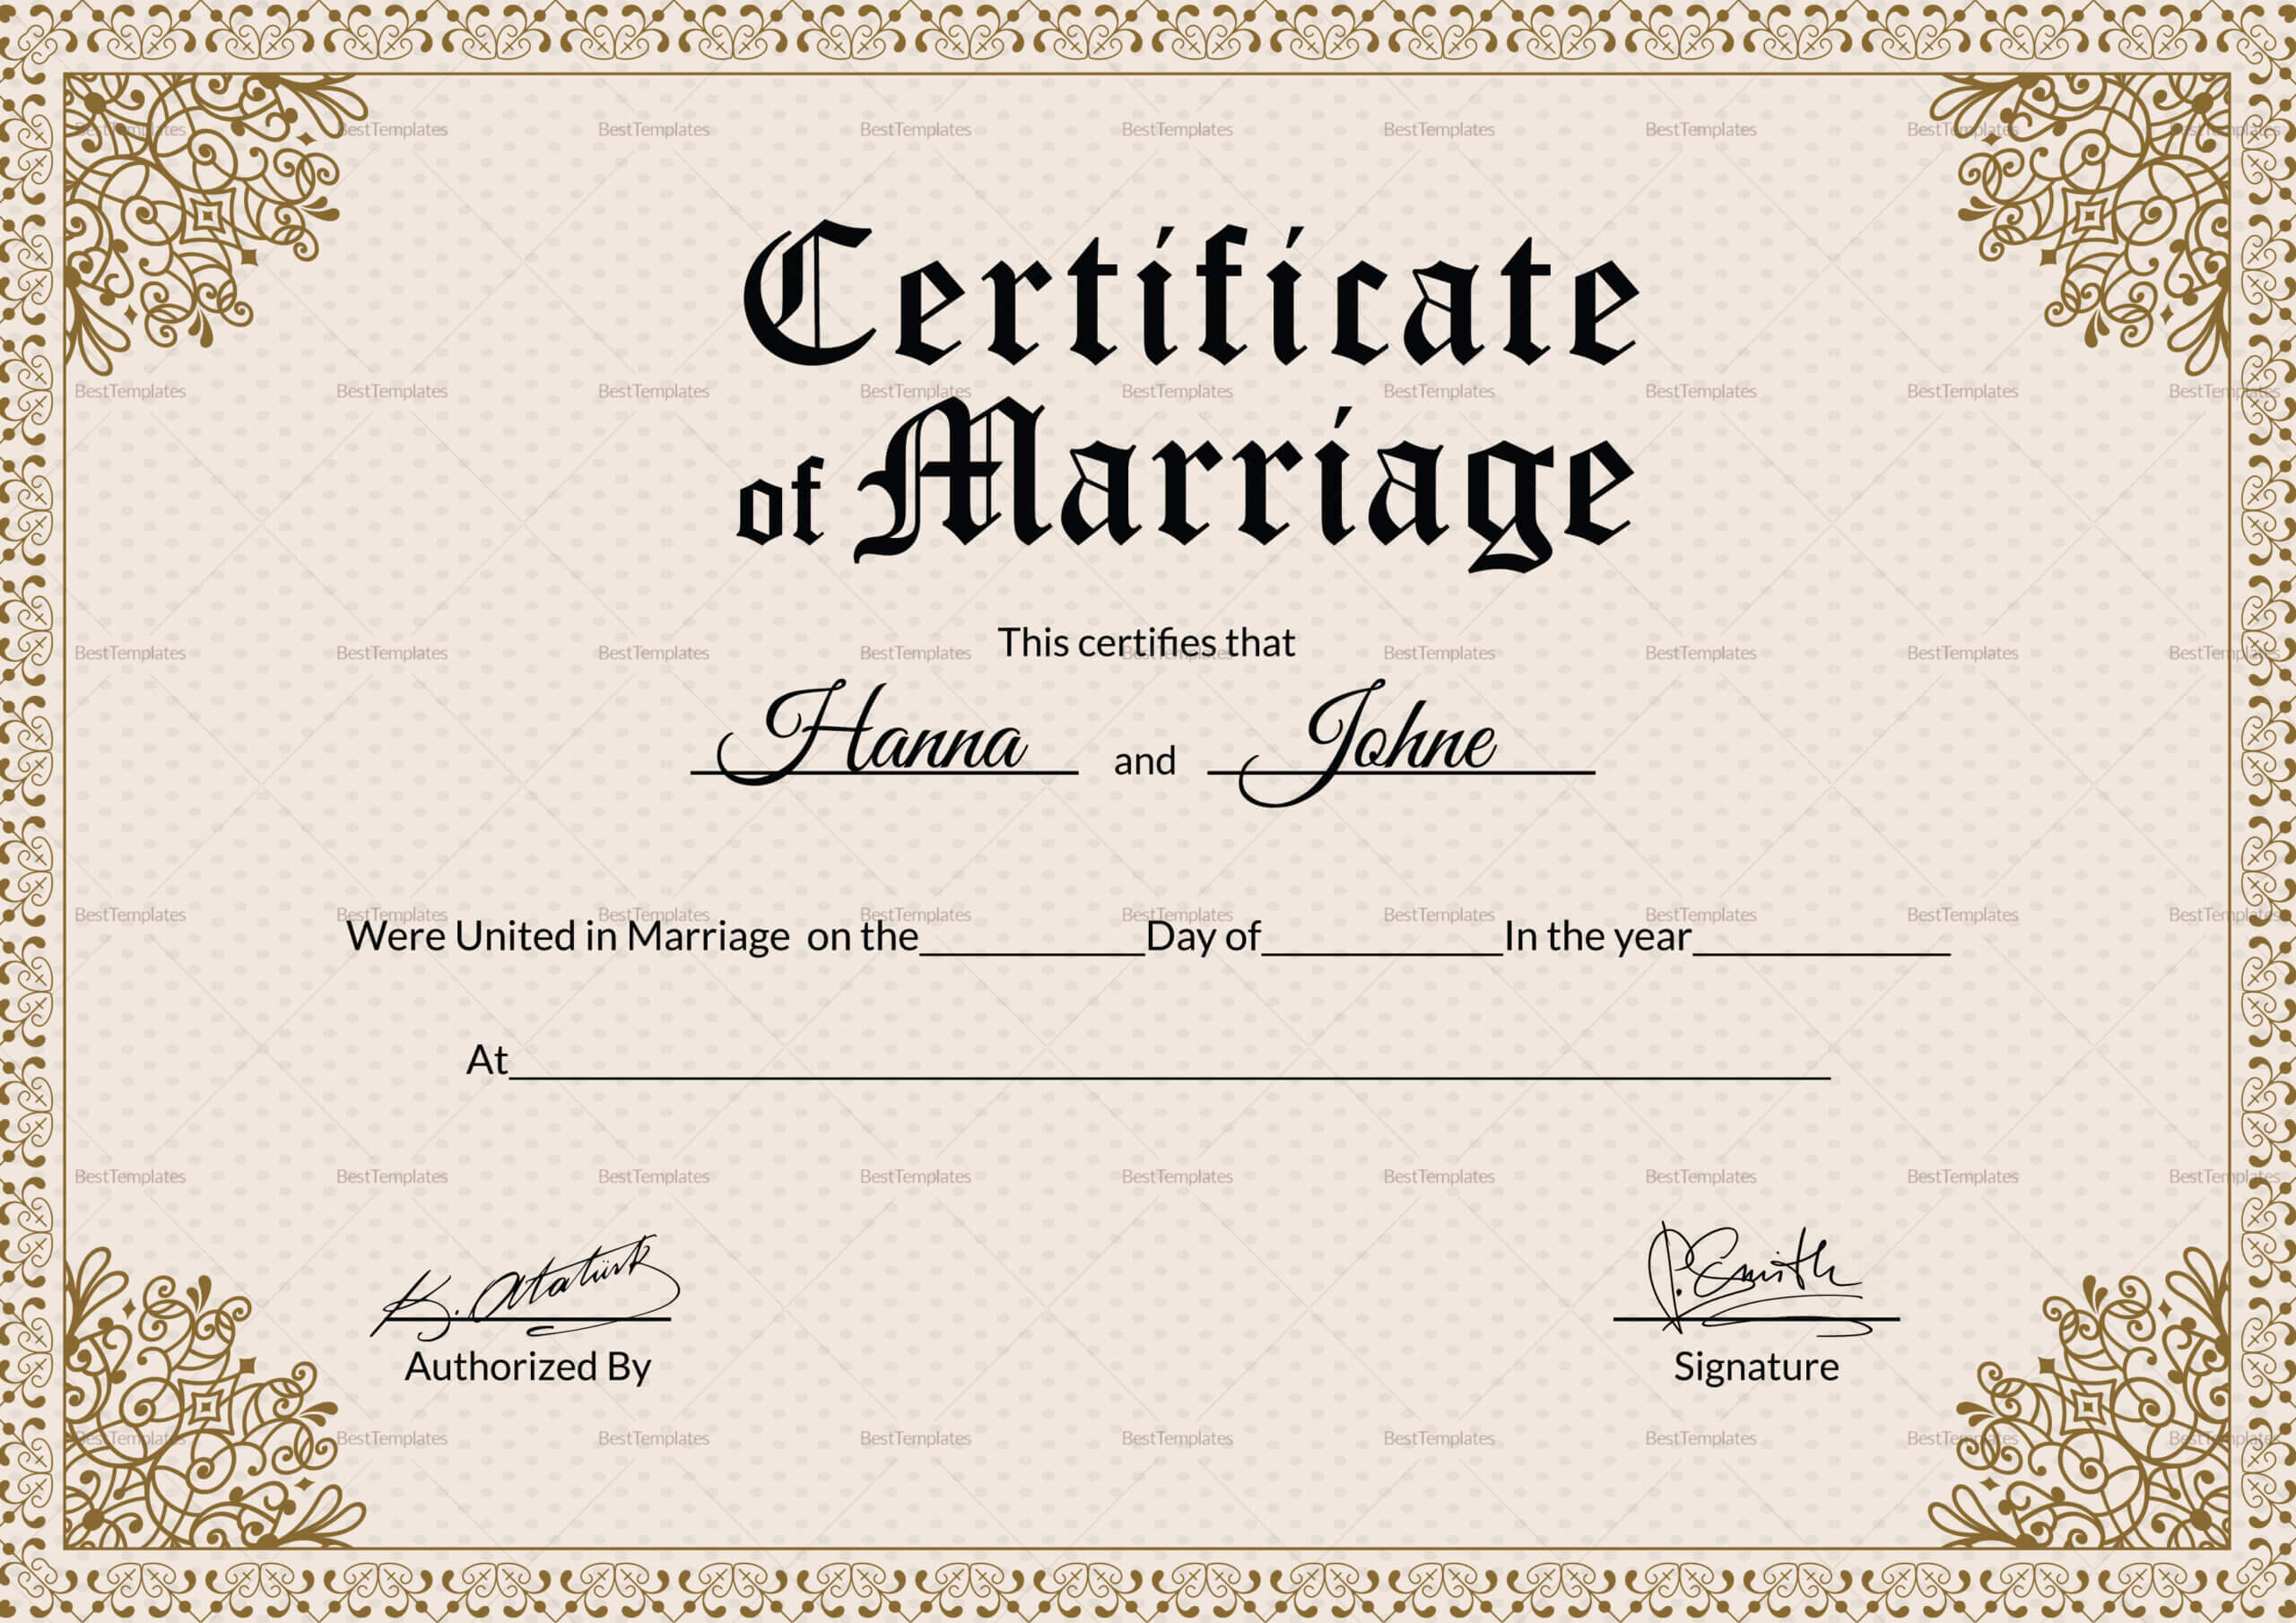 001 Keepsake Marriage Certificate28129 Template Ideas Regarding Certificate Of Marriage Template